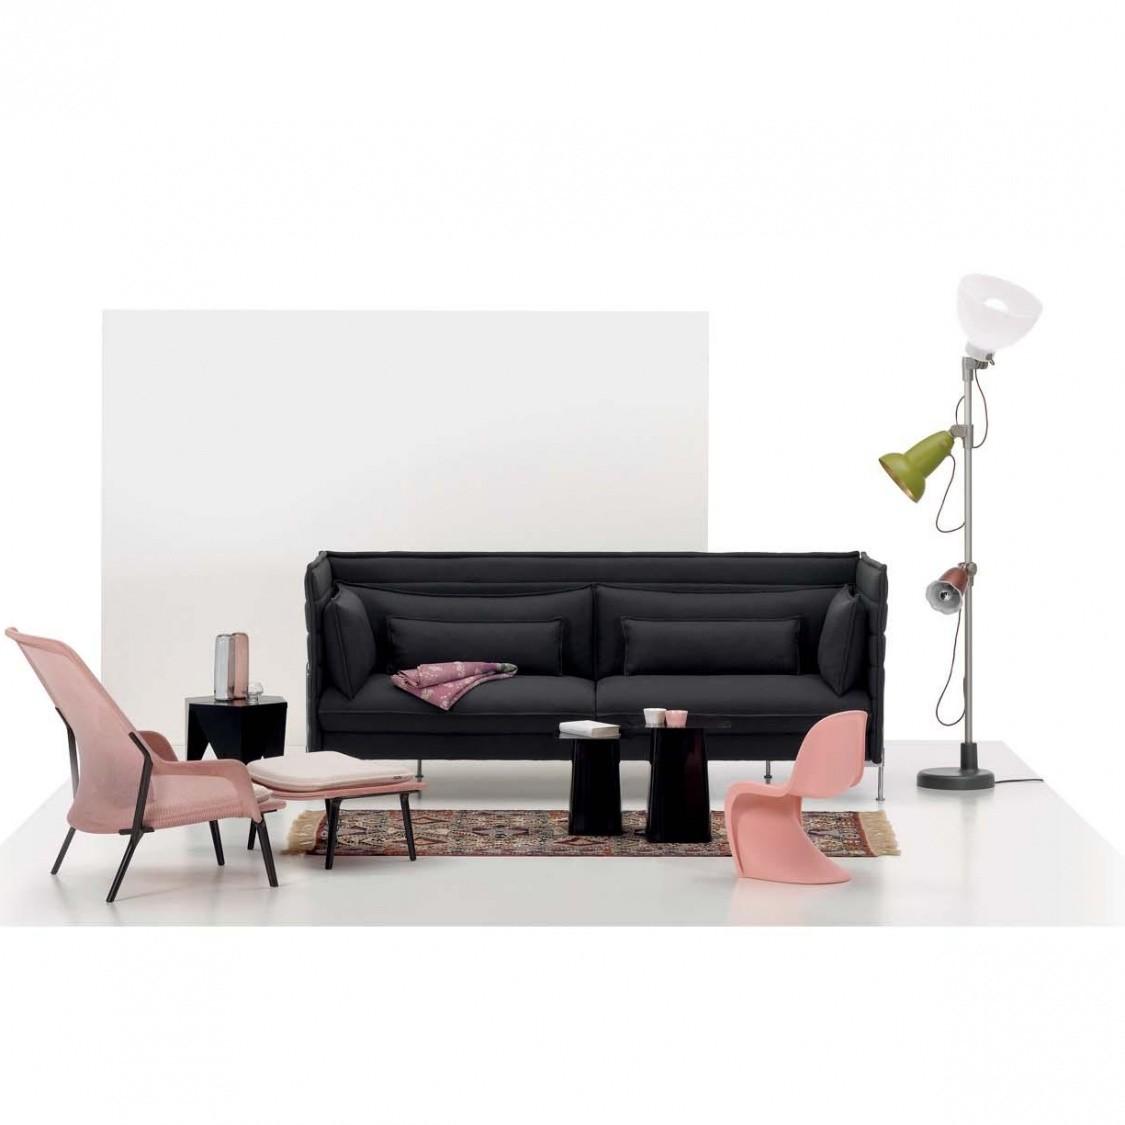 Slow chair lounge chair ottoman vitra for Vitra lounge chair nachbau